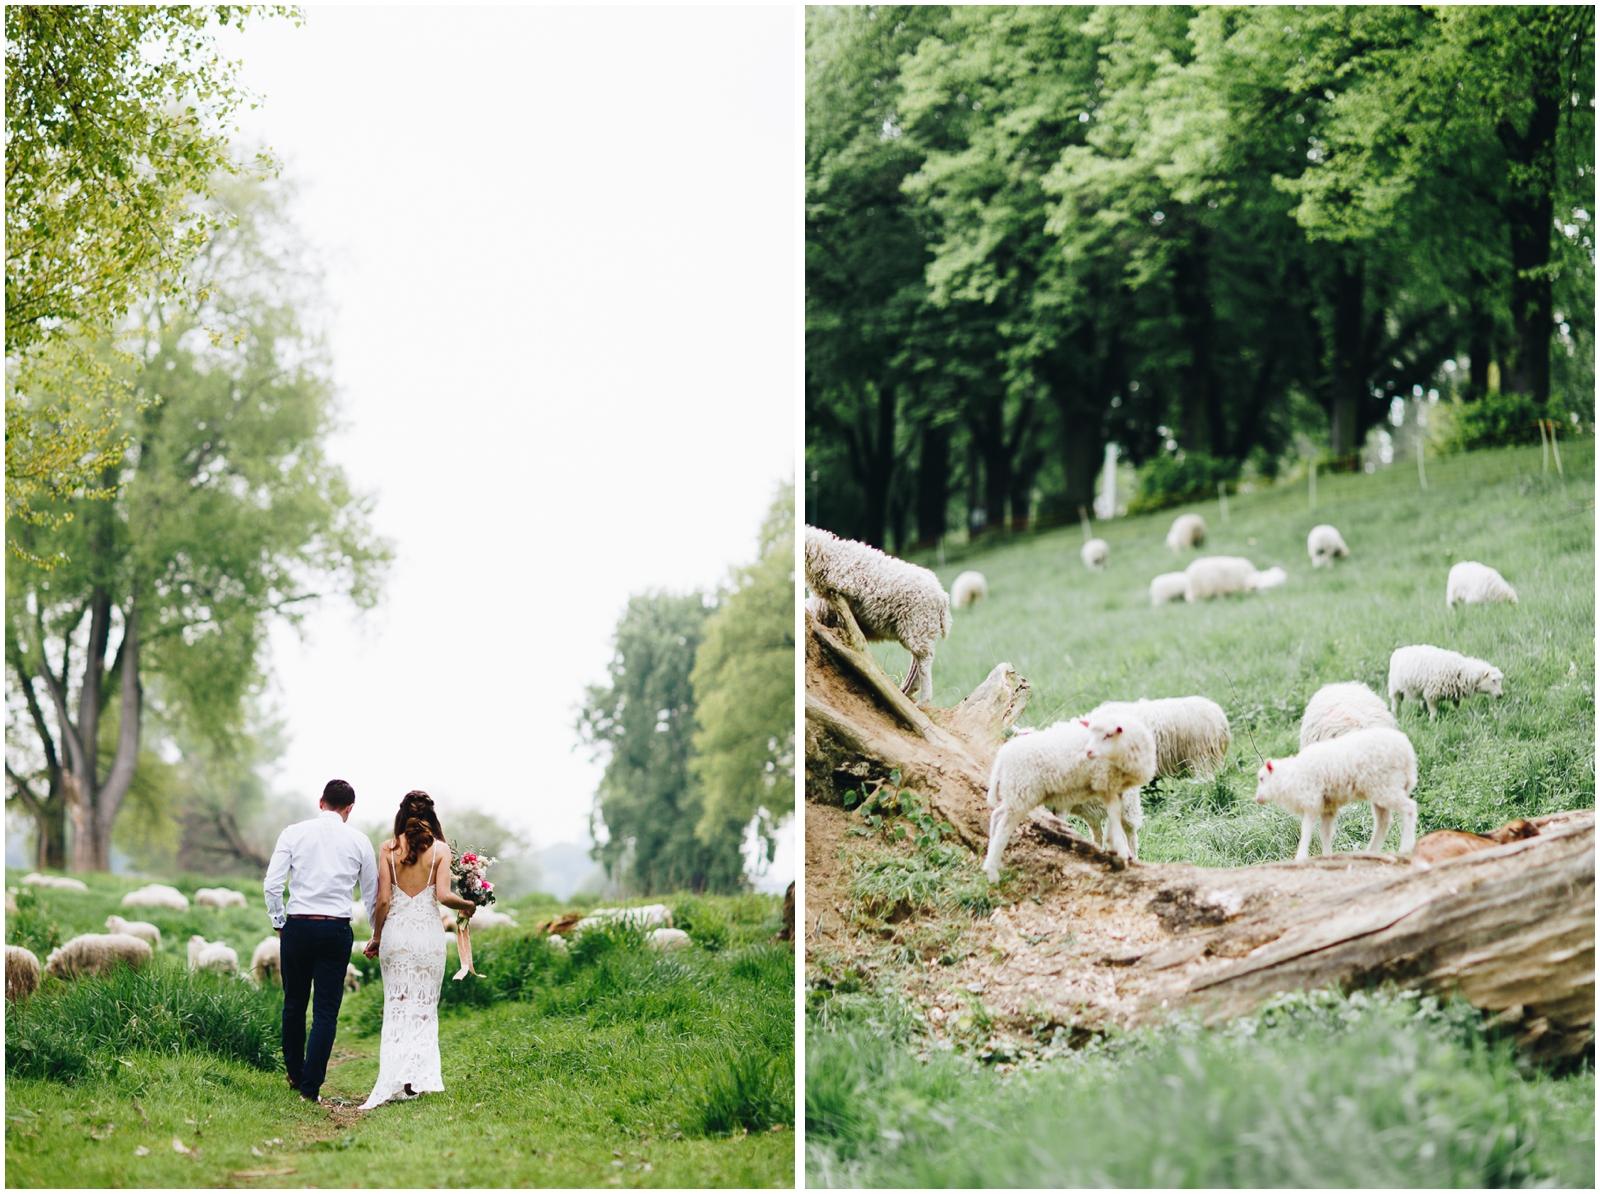 LE HAI LINH Photography-Hochzeitsfotograf-Bohohochzeit-_0043.jpg